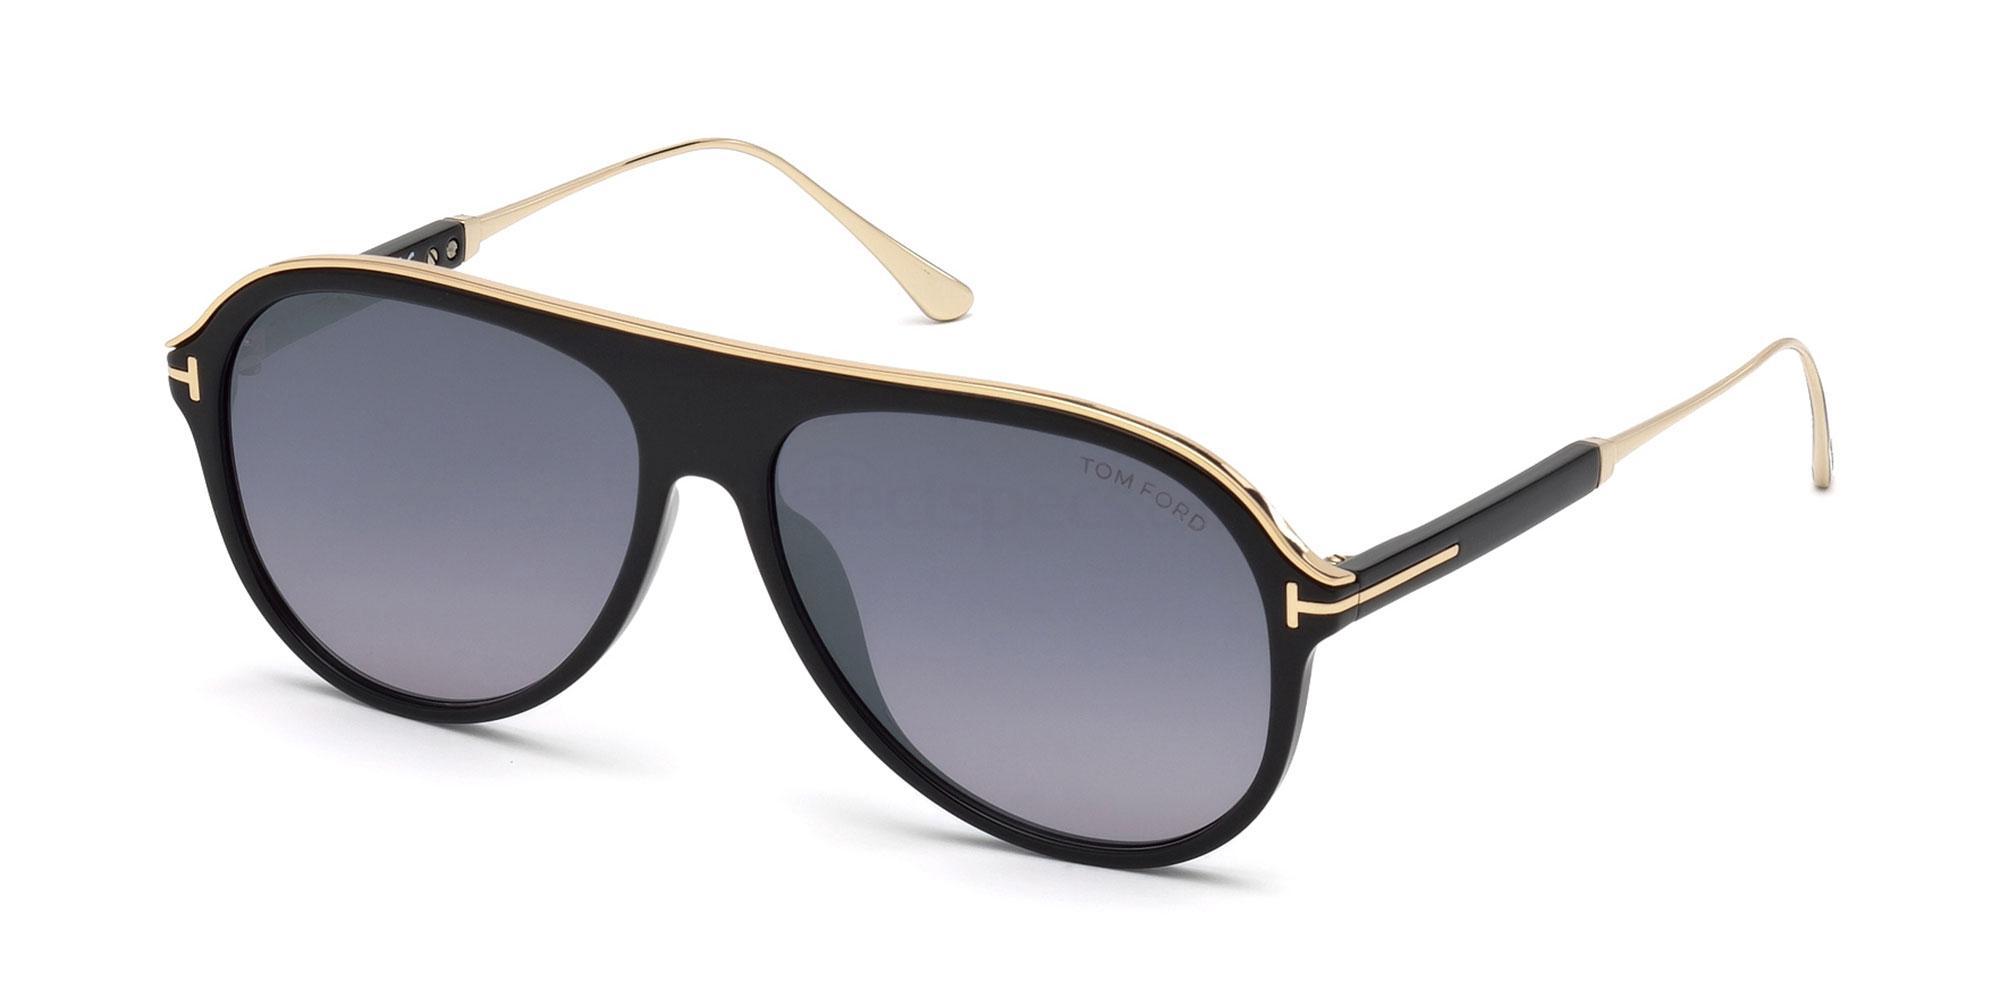 01C FT0624 Sunglasses, Tom Ford